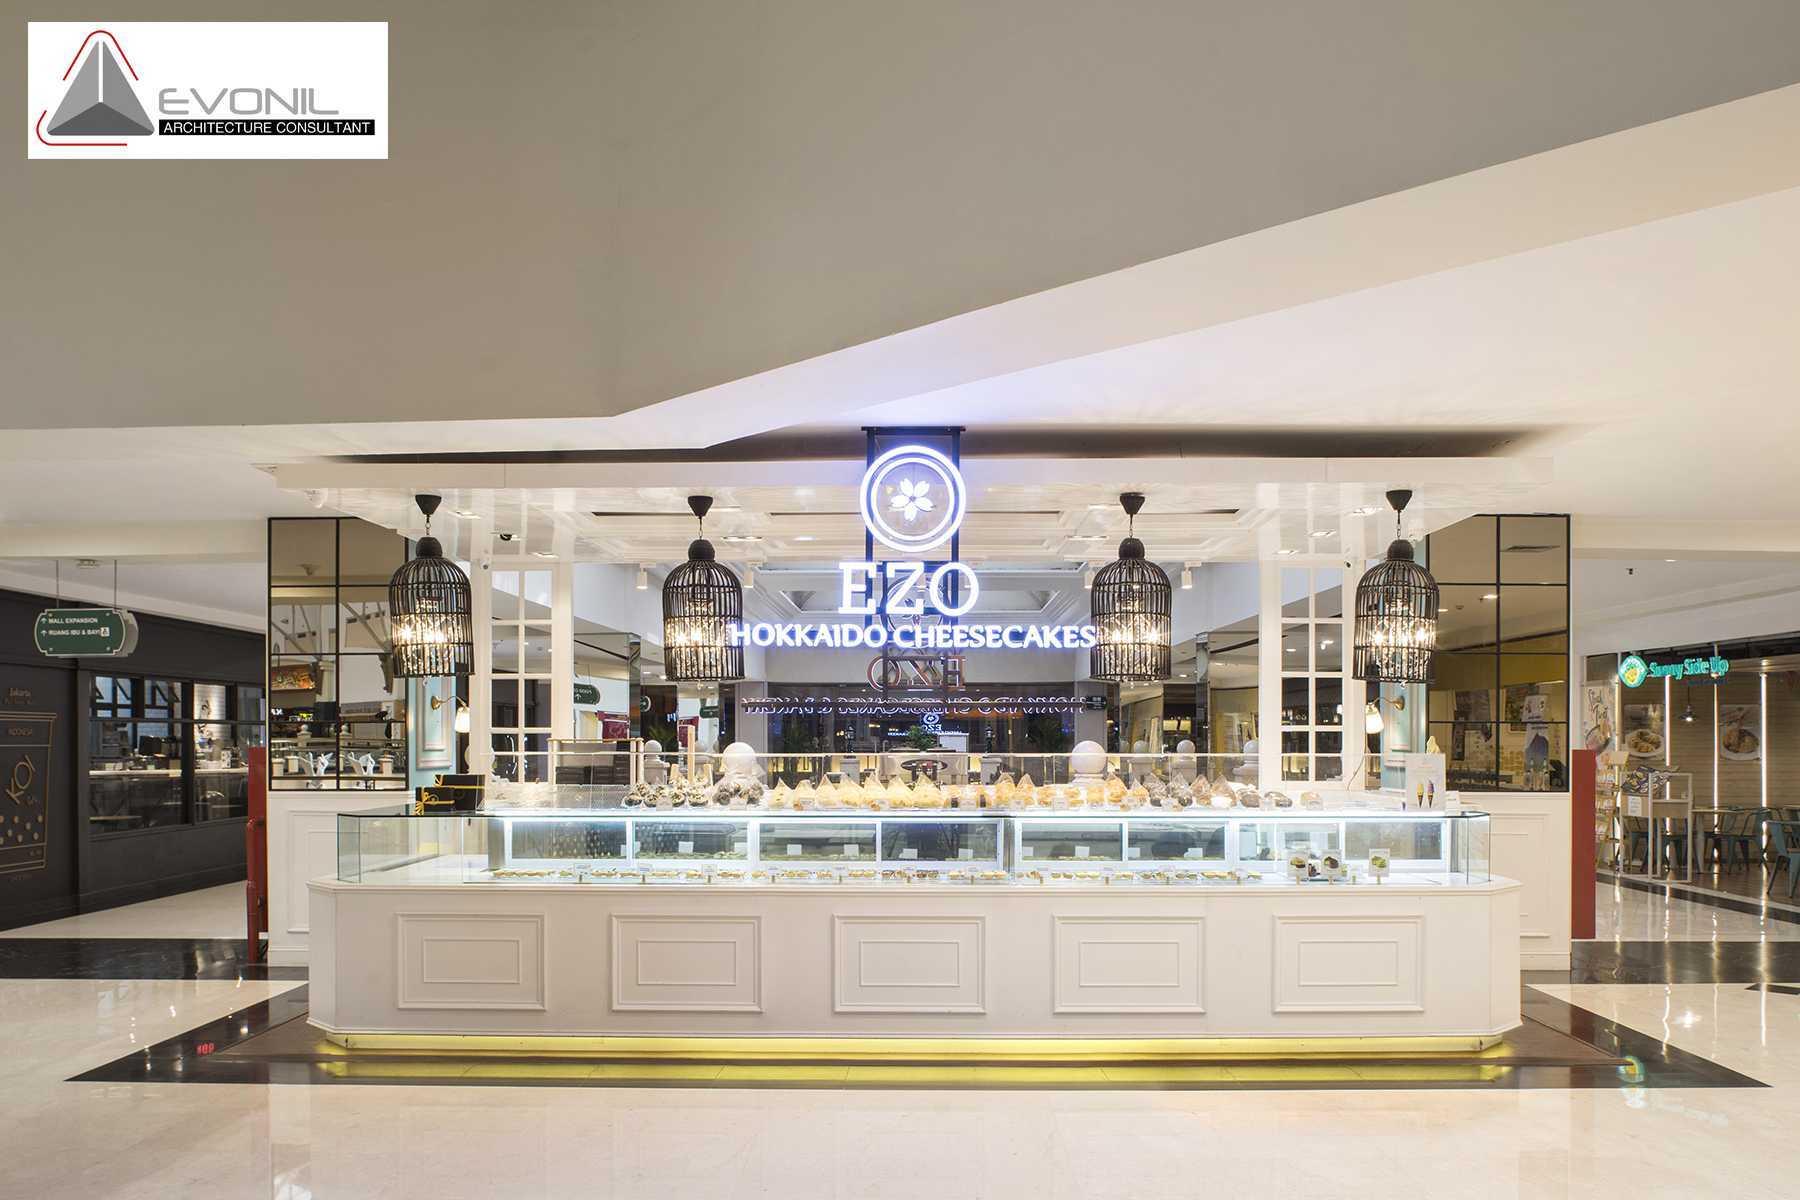 Evonil Architecture Ezo Cheesecakes Bakery - Mall Puri Indah Jakarta, Daerah Khusus Ibukota Jakarta, Indonesia Jakarta, Daerah Khusus Ibukota Jakarta, Indonesia Evonil-Architecture-Ezo-Cheesecakes-Bakery-Mall-Puri-Indah  59578